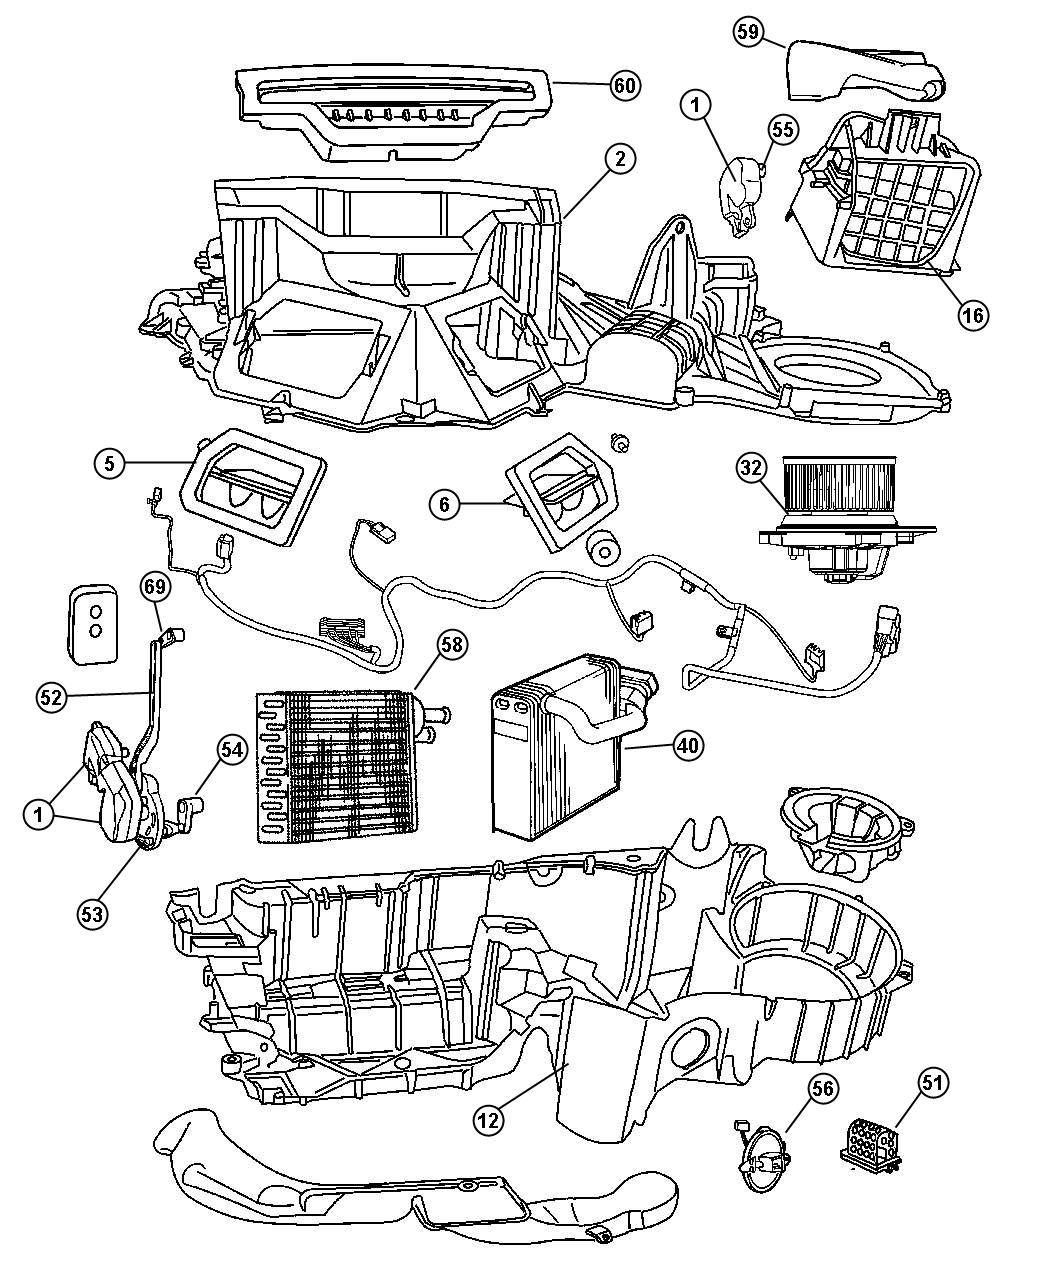 Dodge Ram Heater Box Diagram